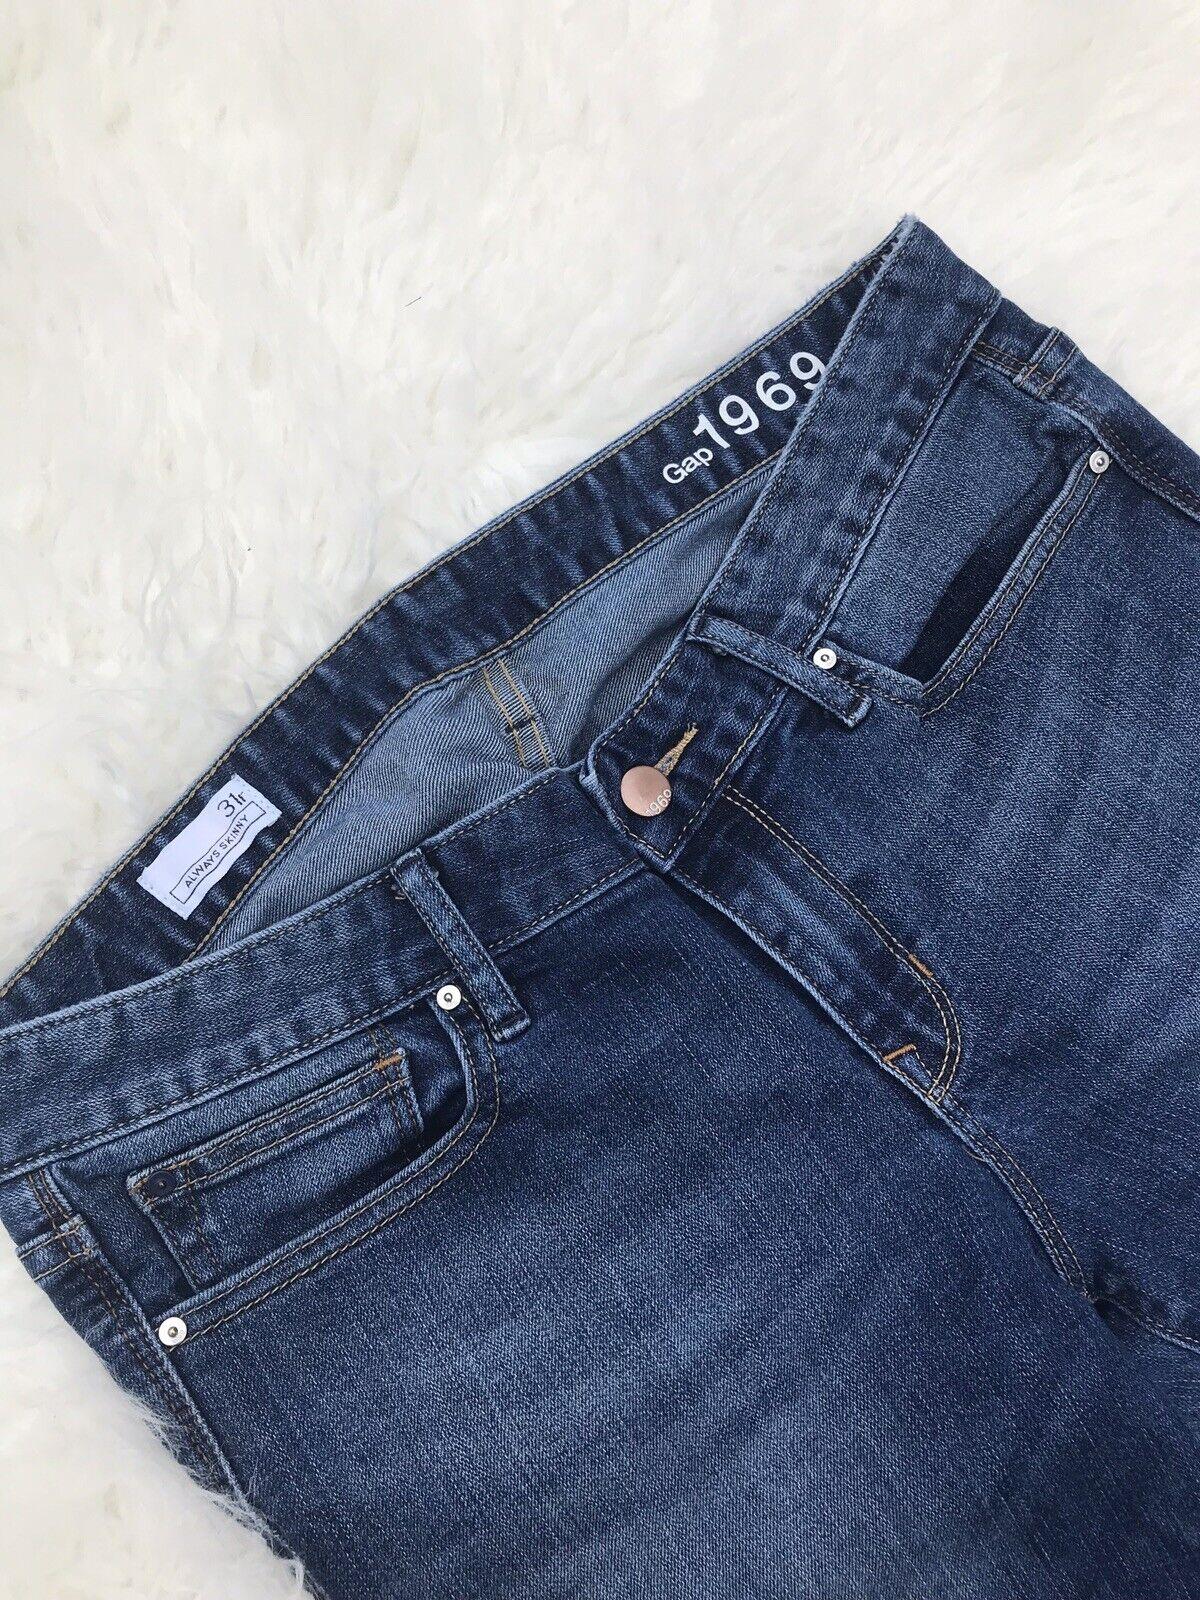 7e38b136d0 Gap 1969 Womens Premium Skinny Jeans Size 12/31R Dark Blue Stretch Mid Rise